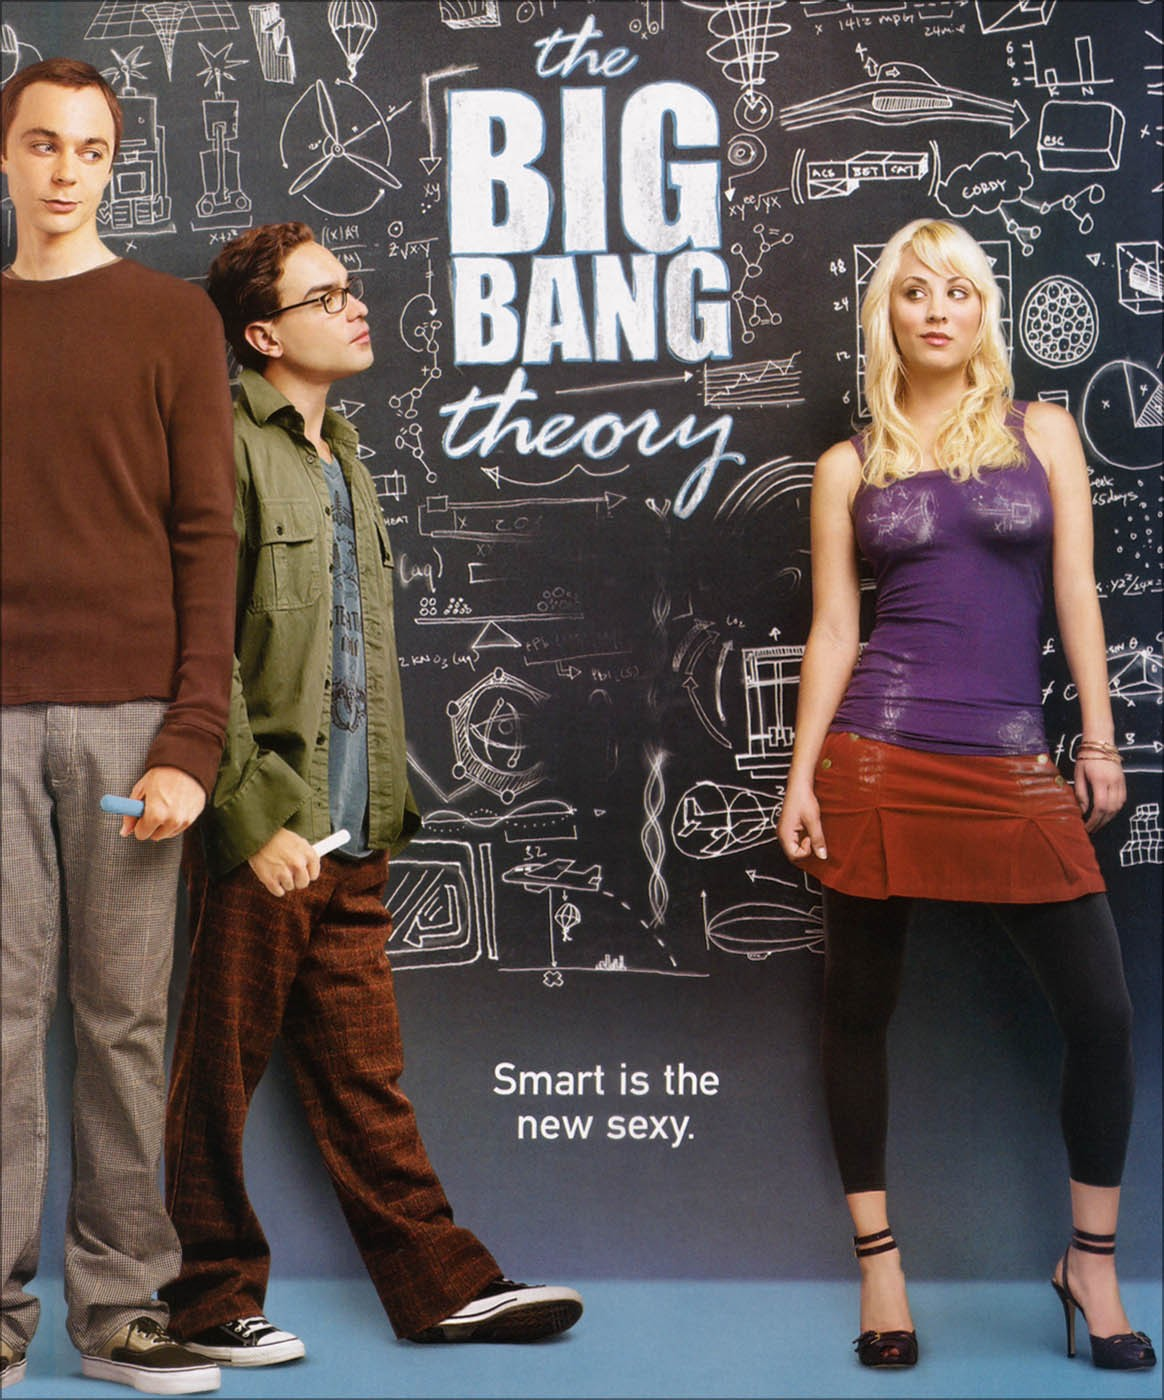 biig bang theory poster